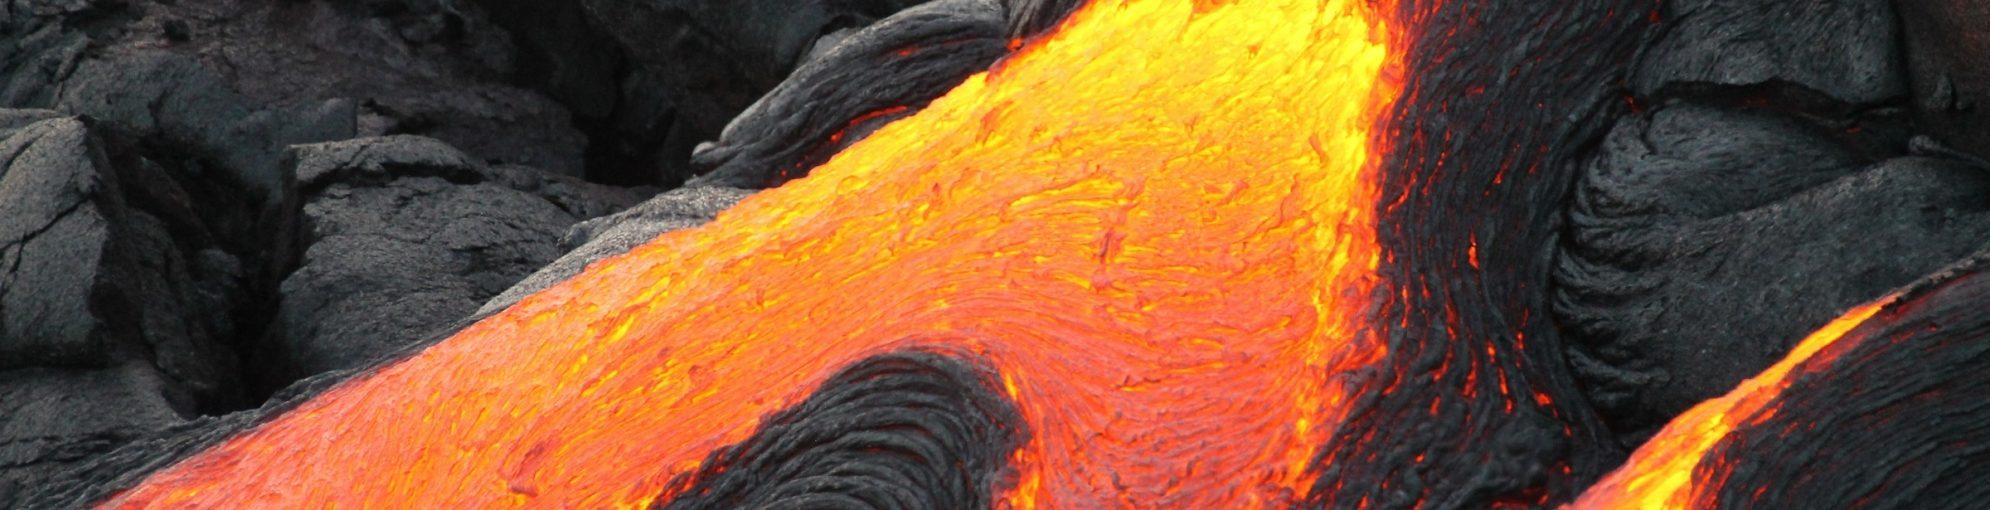 Tephra 2014 – Maximizing the potential of tephra for multidisciplinary science